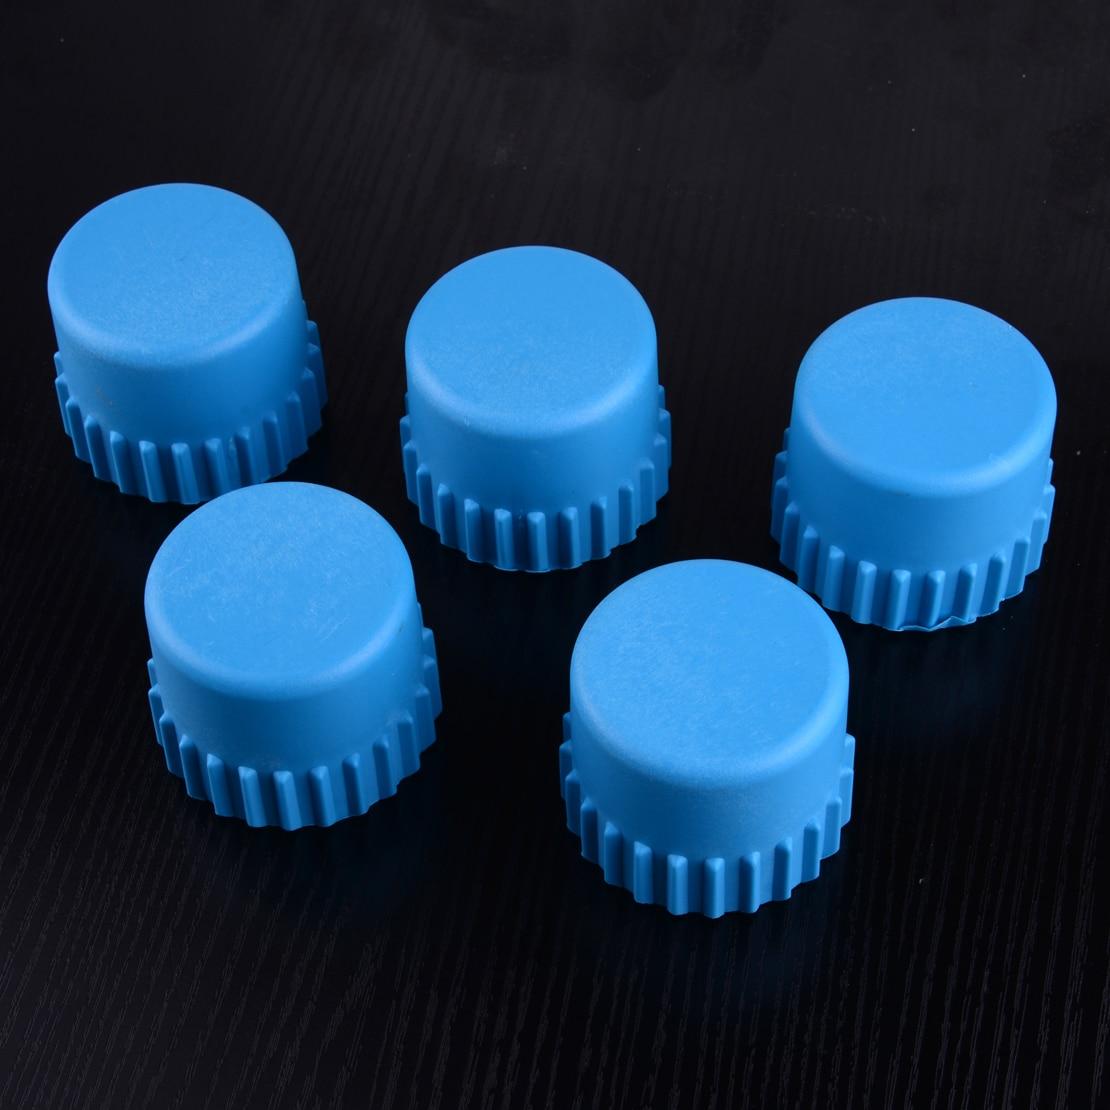 LETAOSK 5pcs 2.5 Blue Nylon Bump Knob 537185801 Fit for Husqvarna T35 Trimmer Head Accessory Parts ReplacementLETAOSK 5pcs 2.5 Blue Nylon Bump Knob 537185801 Fit for Husqvarna T35 Trimmer Head Accessory Parts Replacement